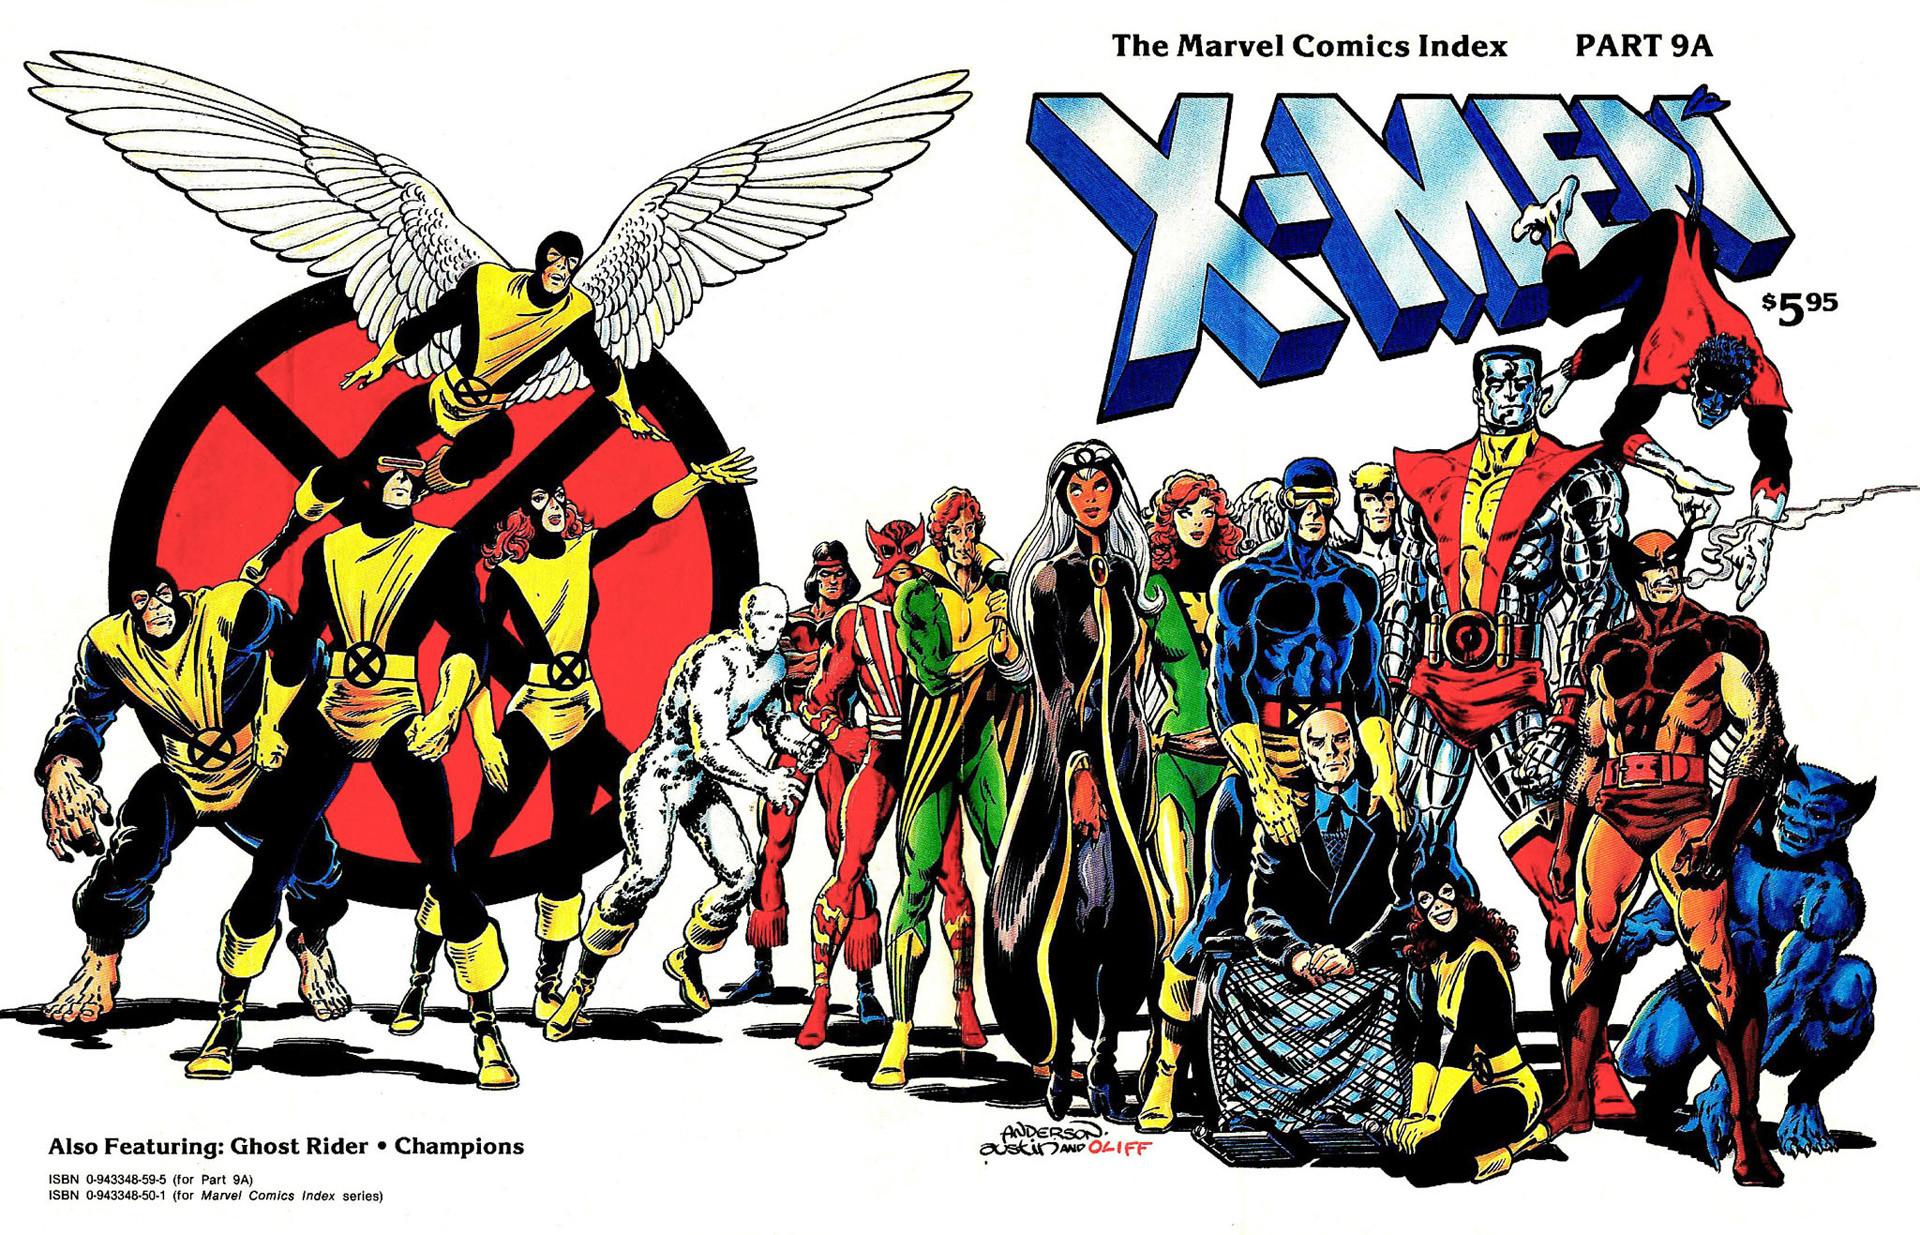 Imagenes De Xmen: X Men Pictures For Wallpaper (71+ Images